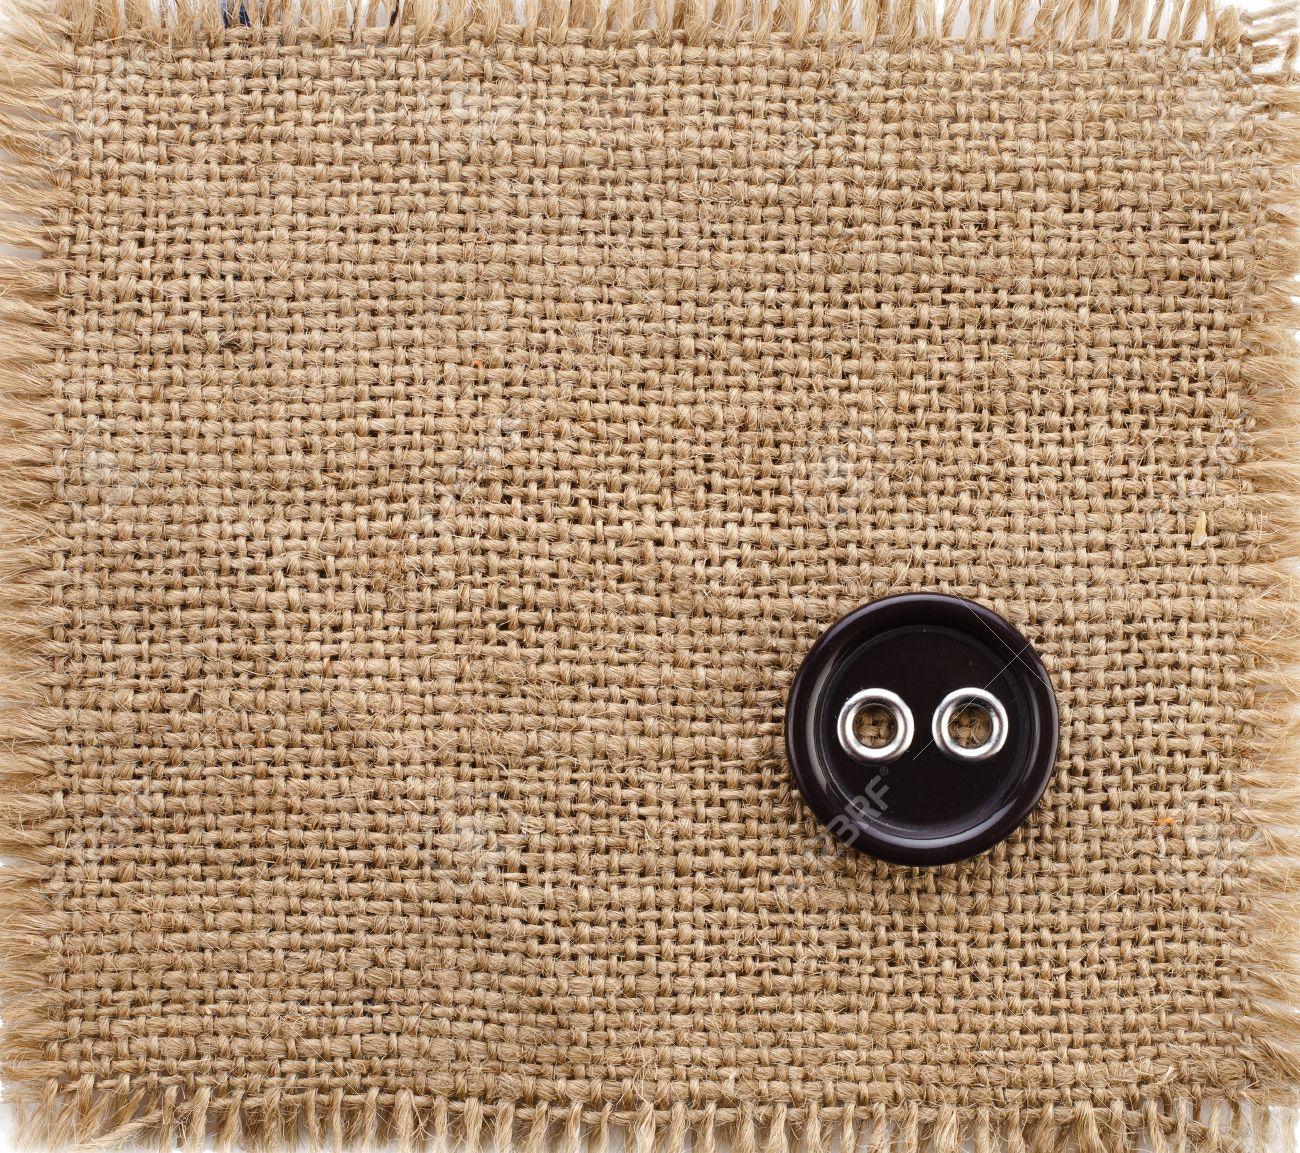 85b8fc795 Foto de archivo - Viejo botón negro sobre tela arpillera textura de fondo